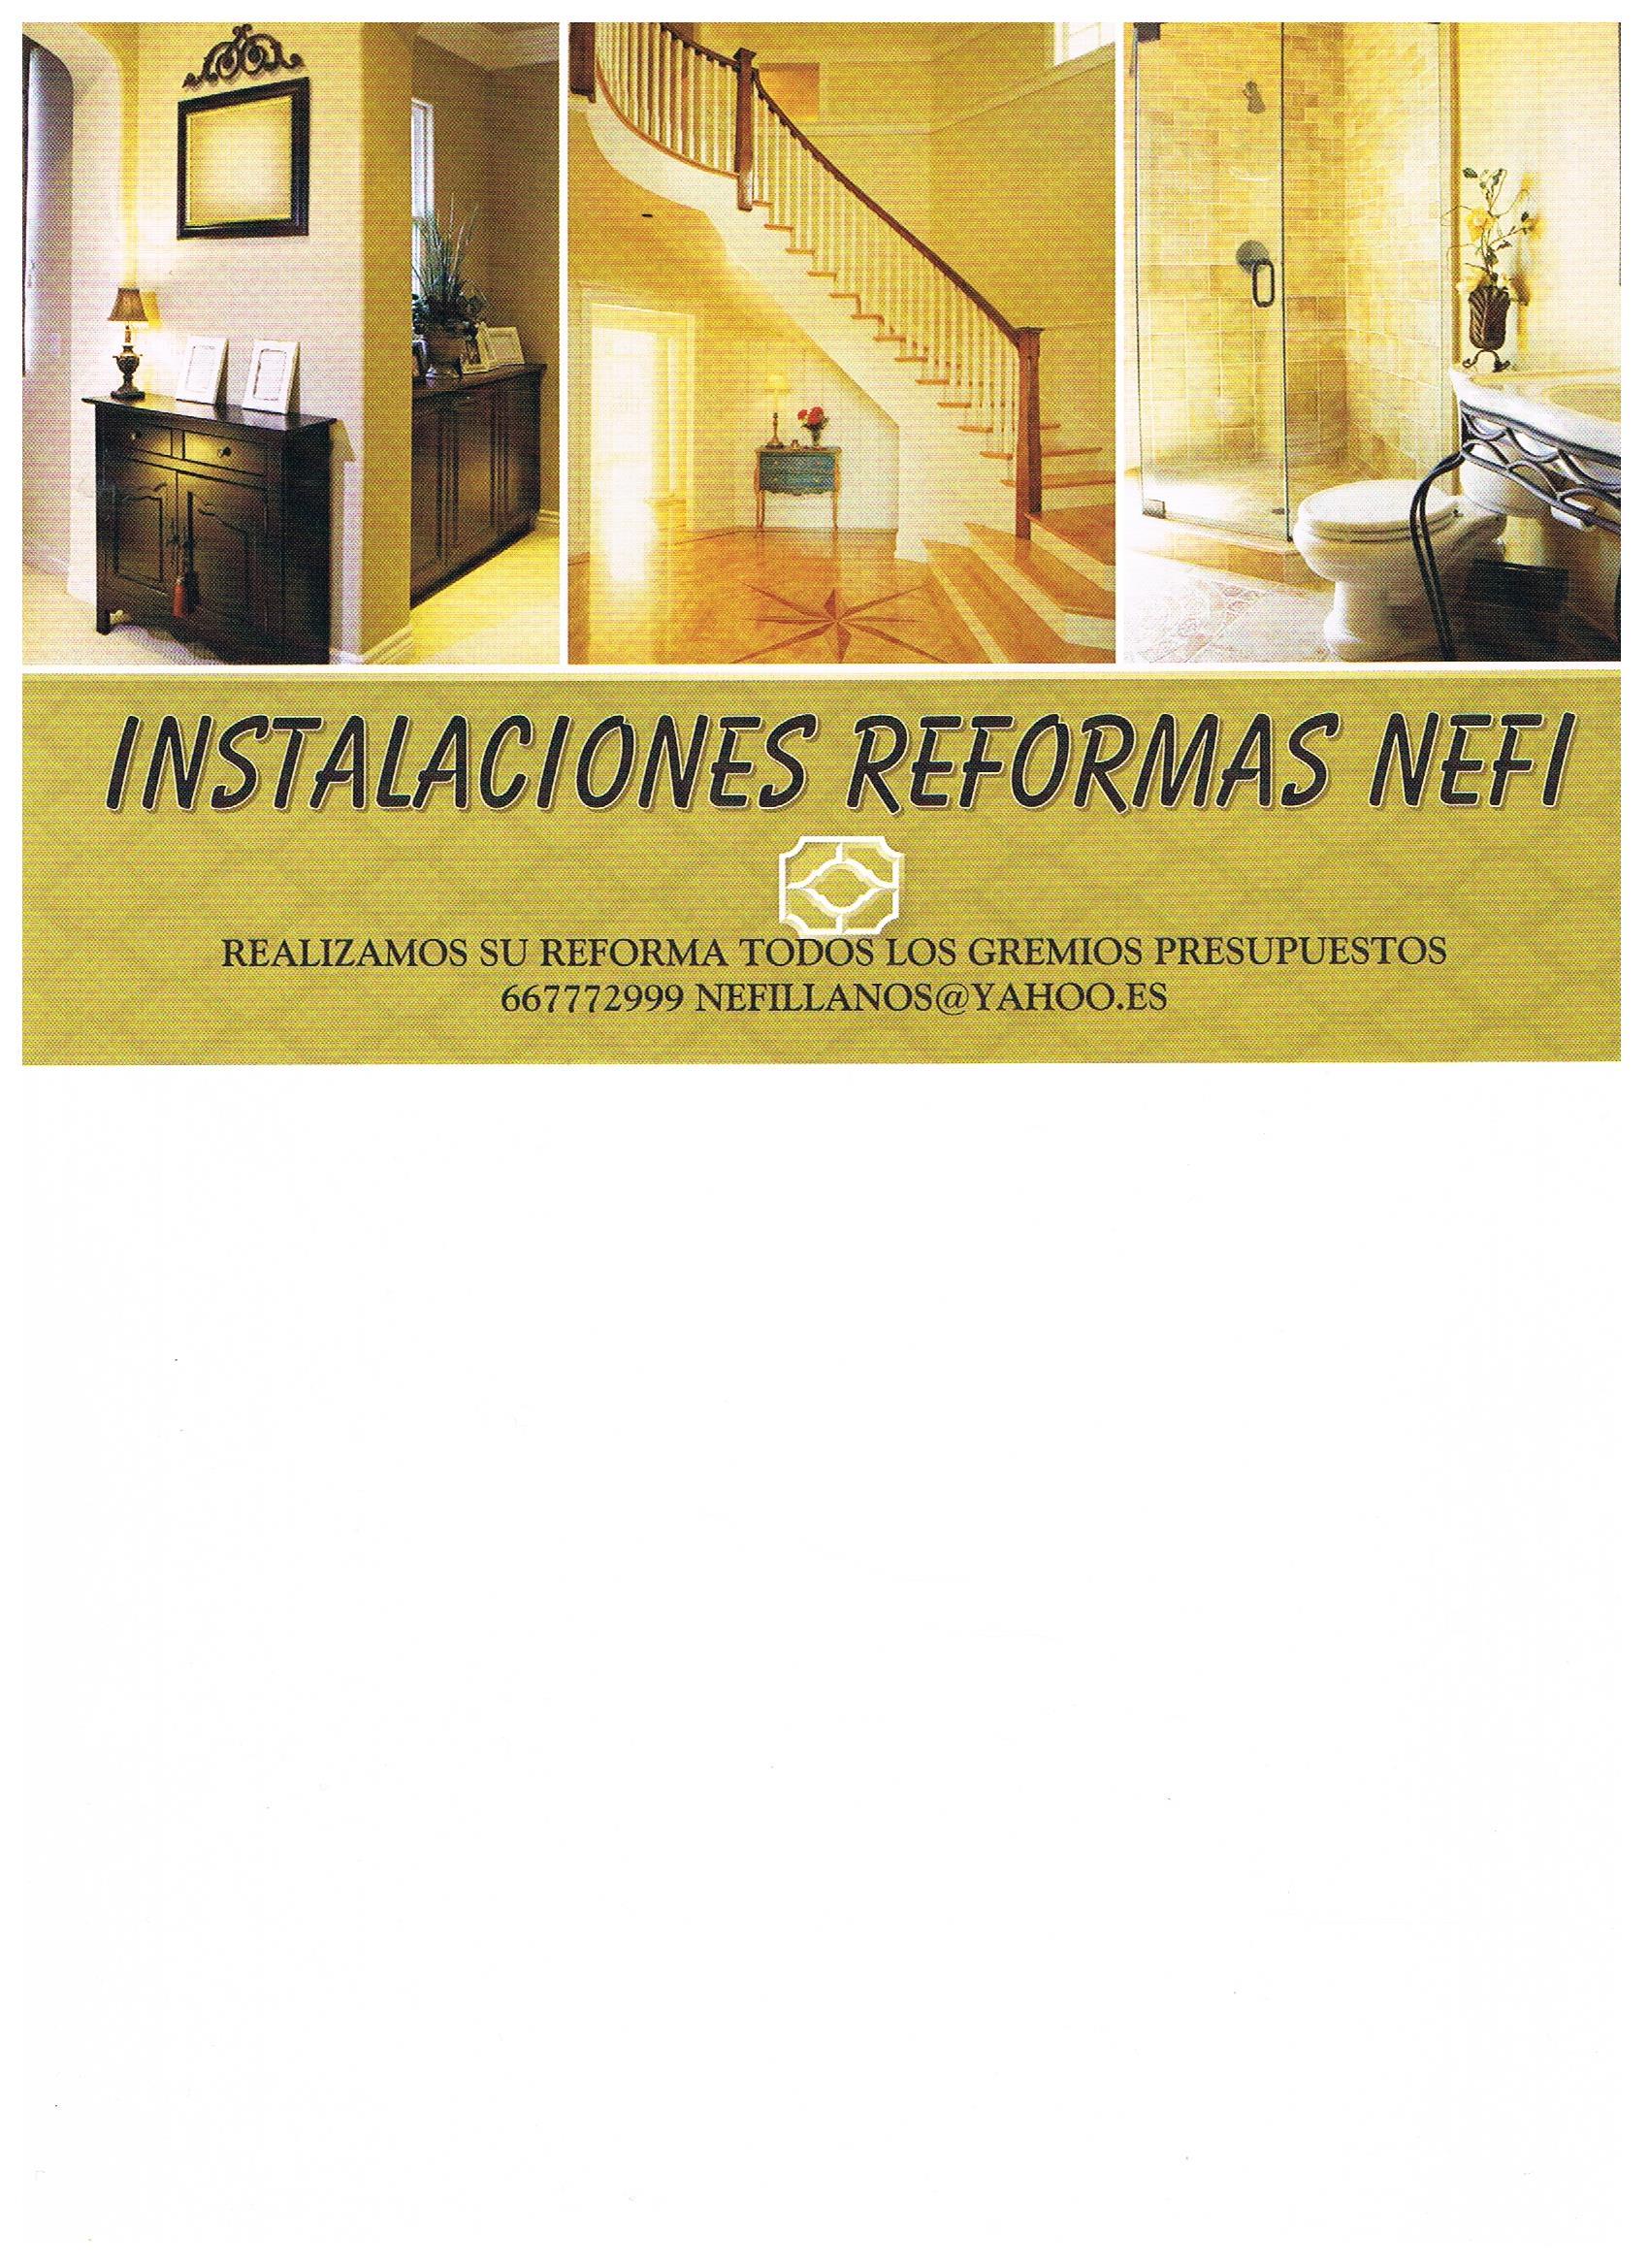 Reformas Nefi